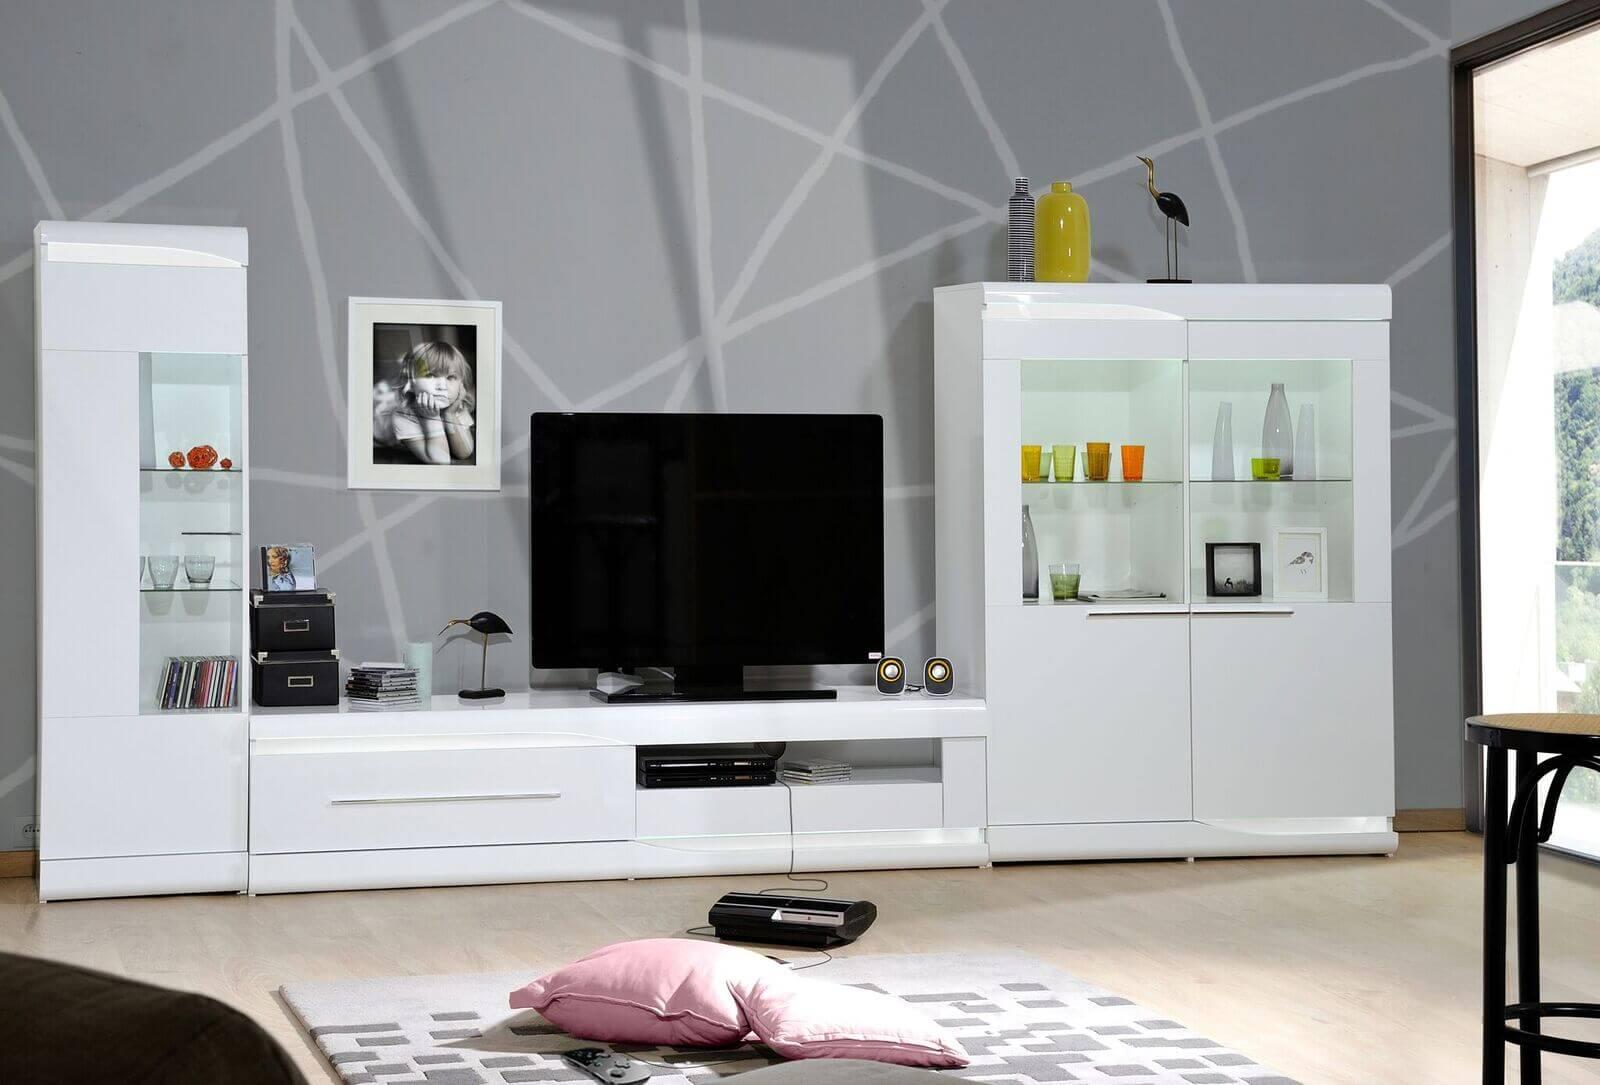 Ovio White Gloss Display Cabinet Modern Furniture Fads # Meuble Tv Ovio